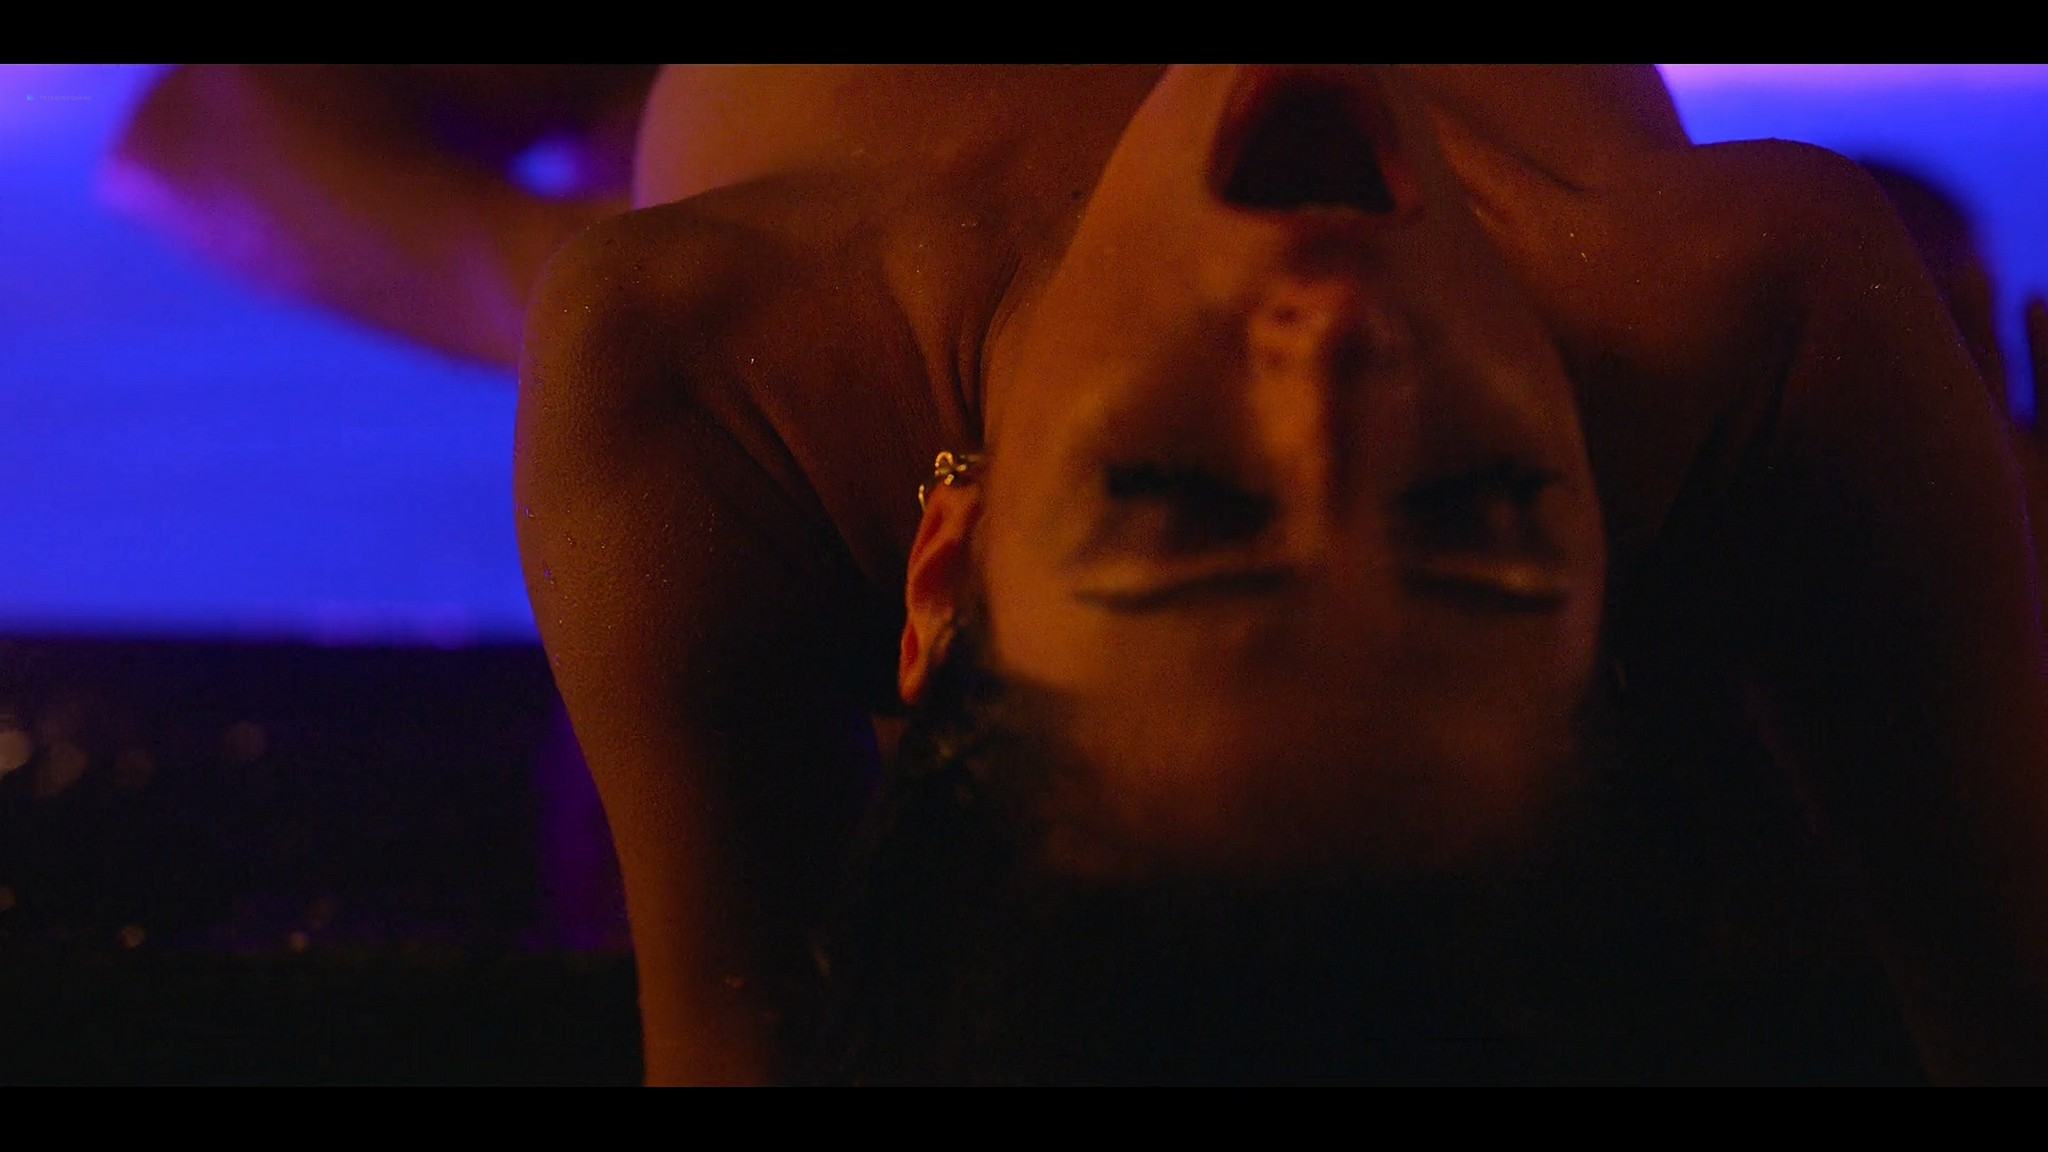 Sarah Shahi nude sex others sex orgy Sex Life 2021 s1e7 8 1080p Web 8